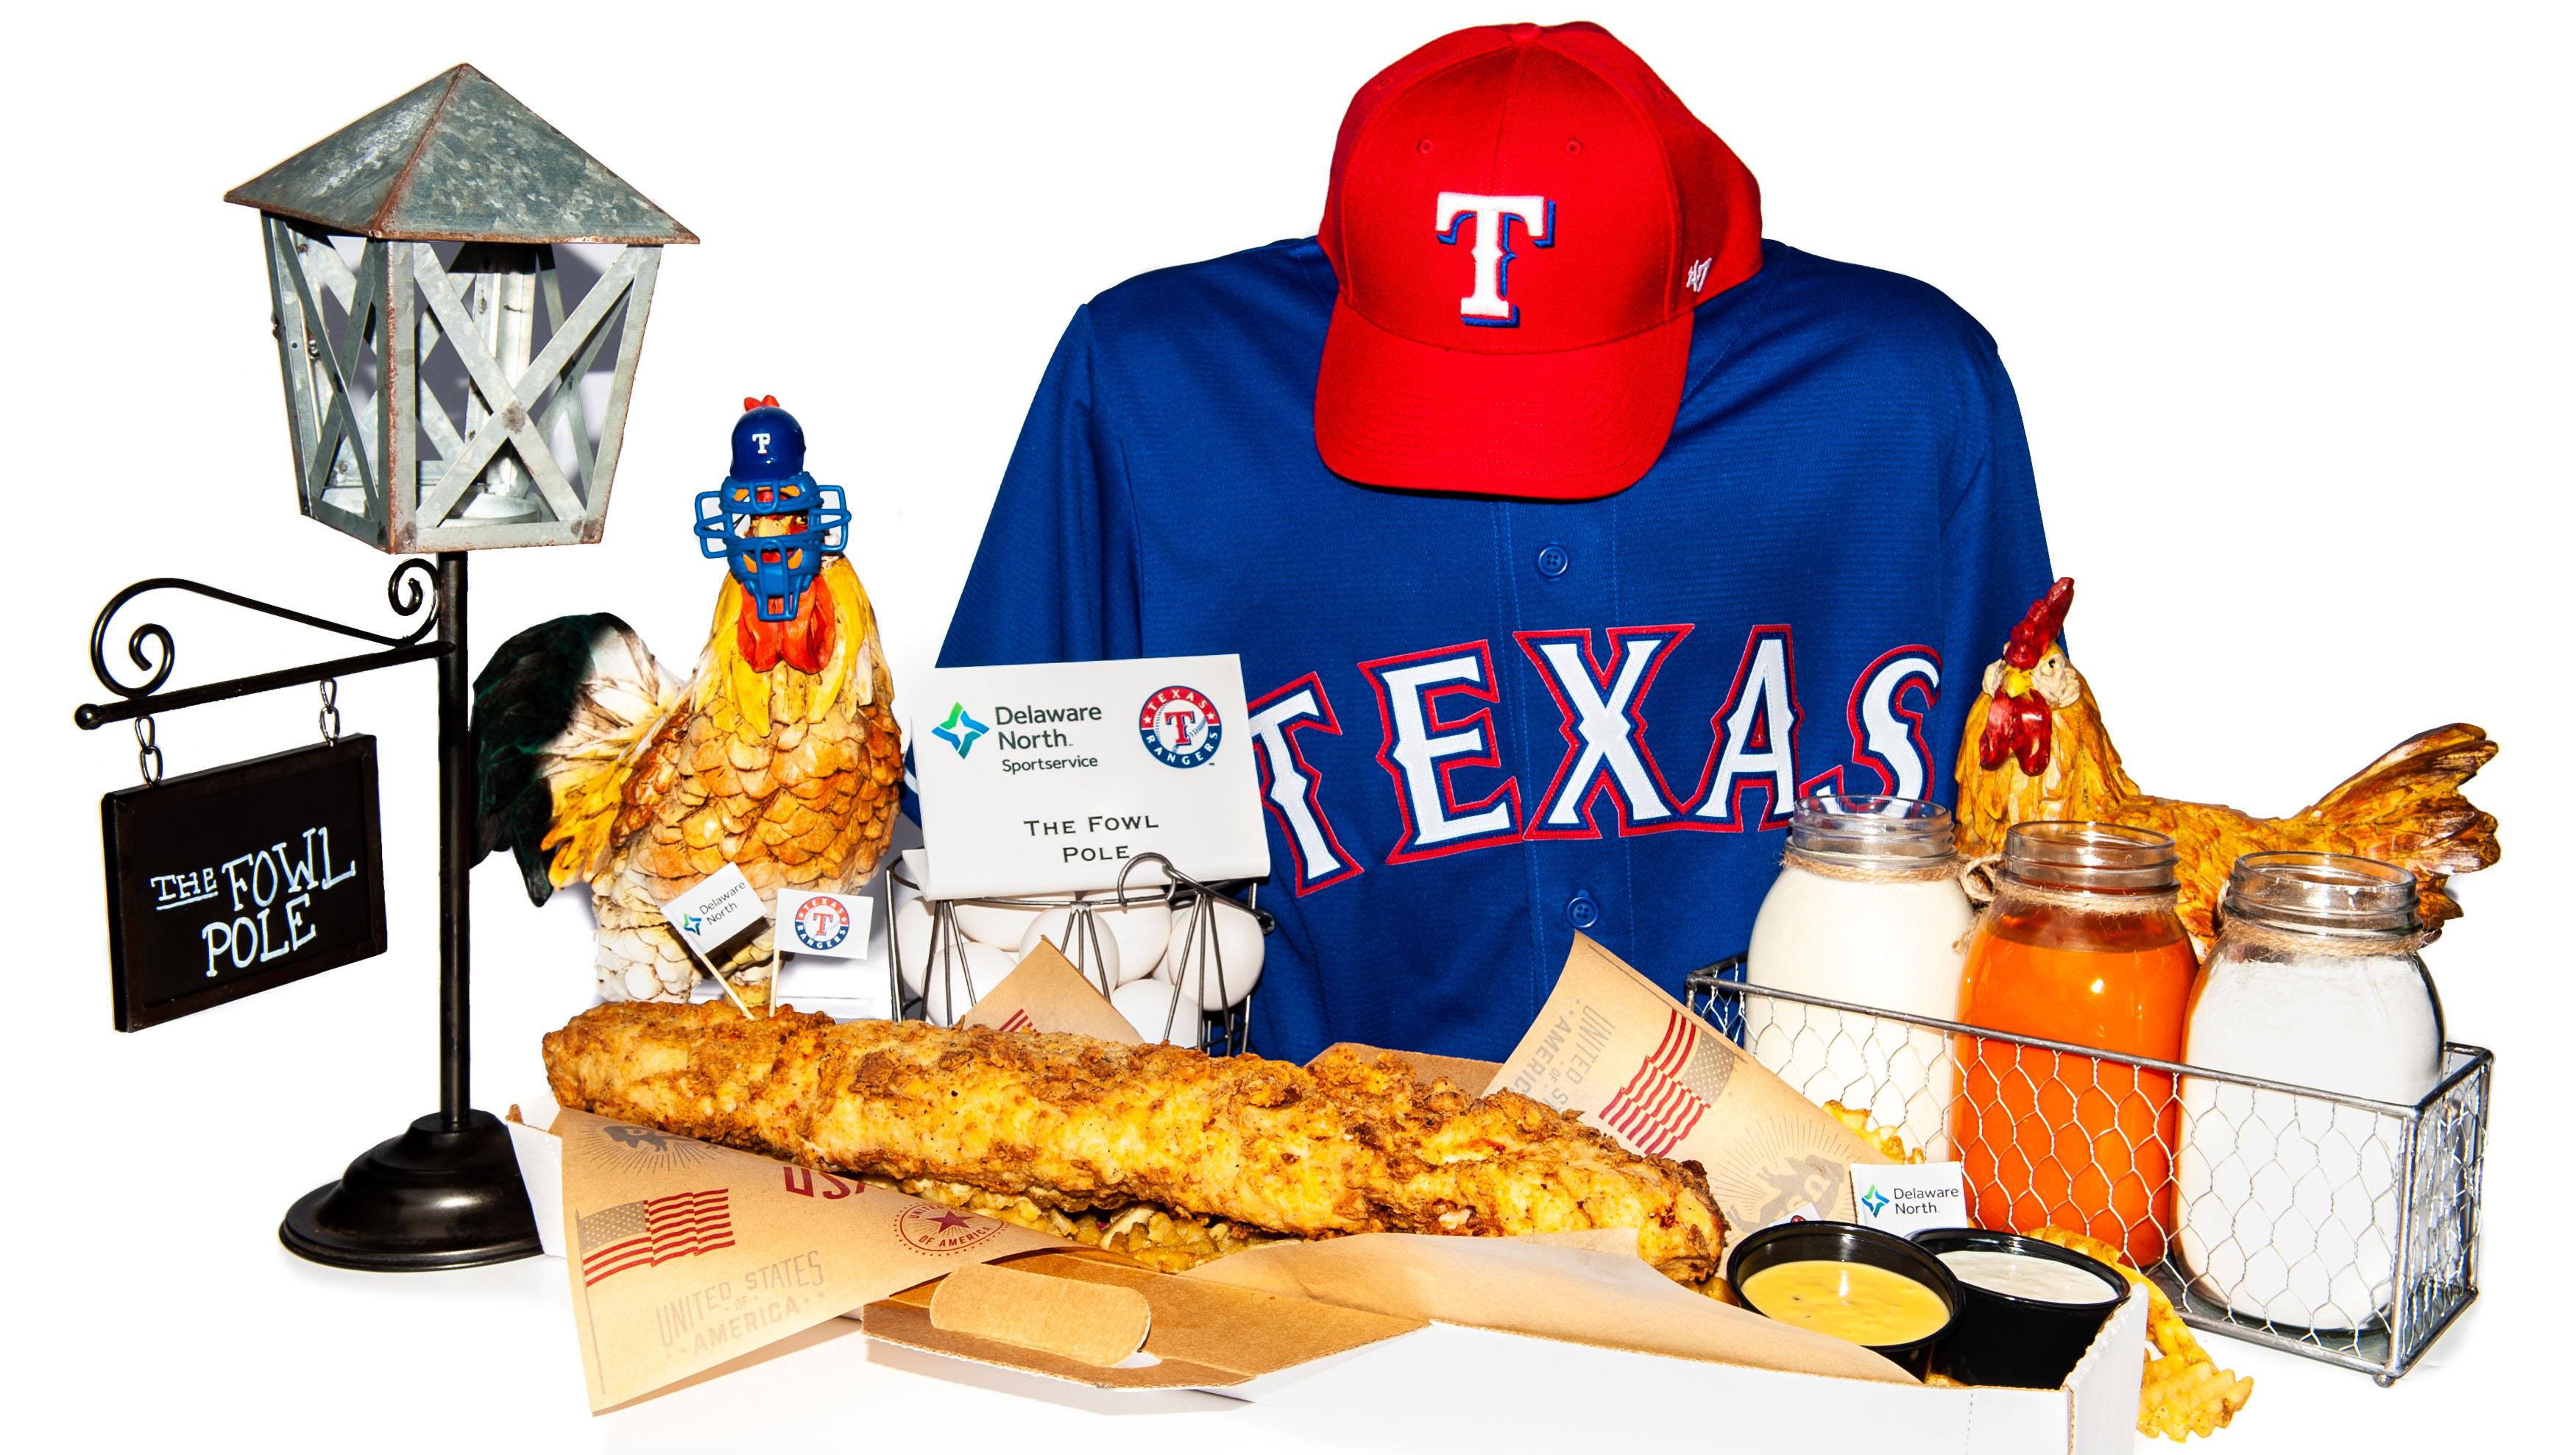 texas-rangers-fowl-pole-food.jpg&w=800&q